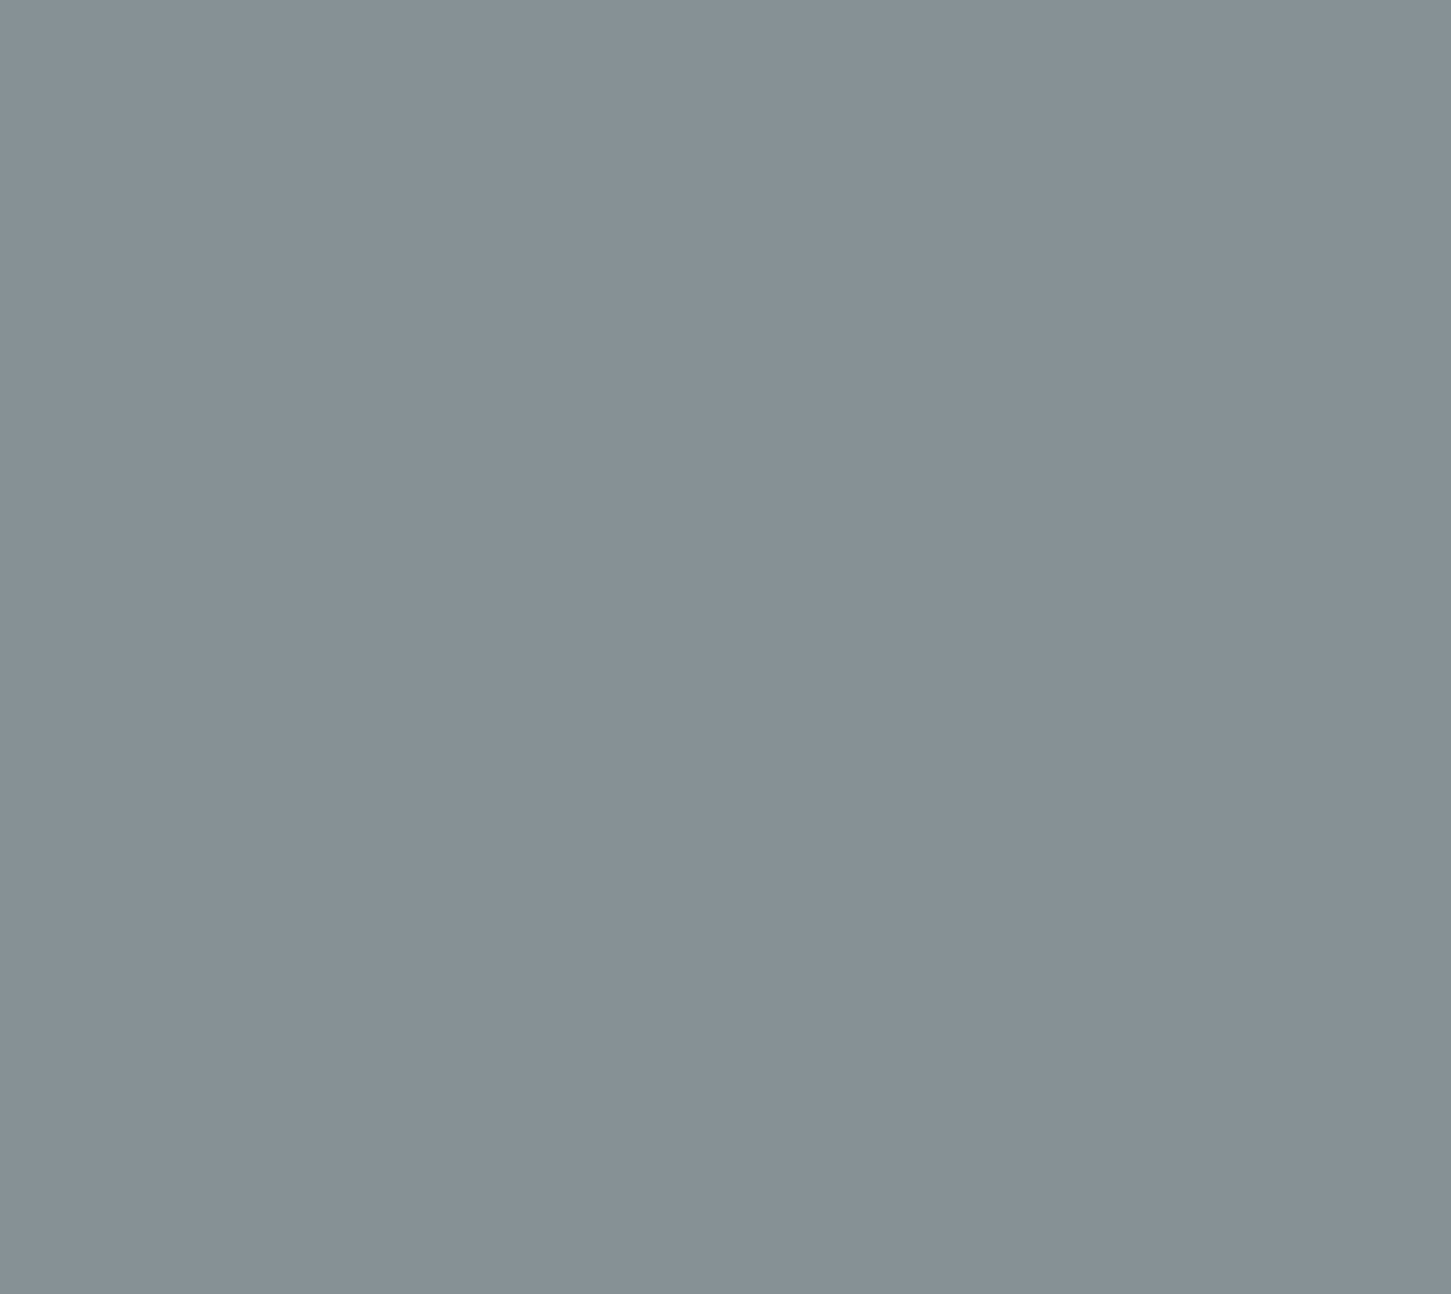 2K Kabelvergussmasse Kabel Vergussmasse Gießharz Elektrovergussmasse weiß